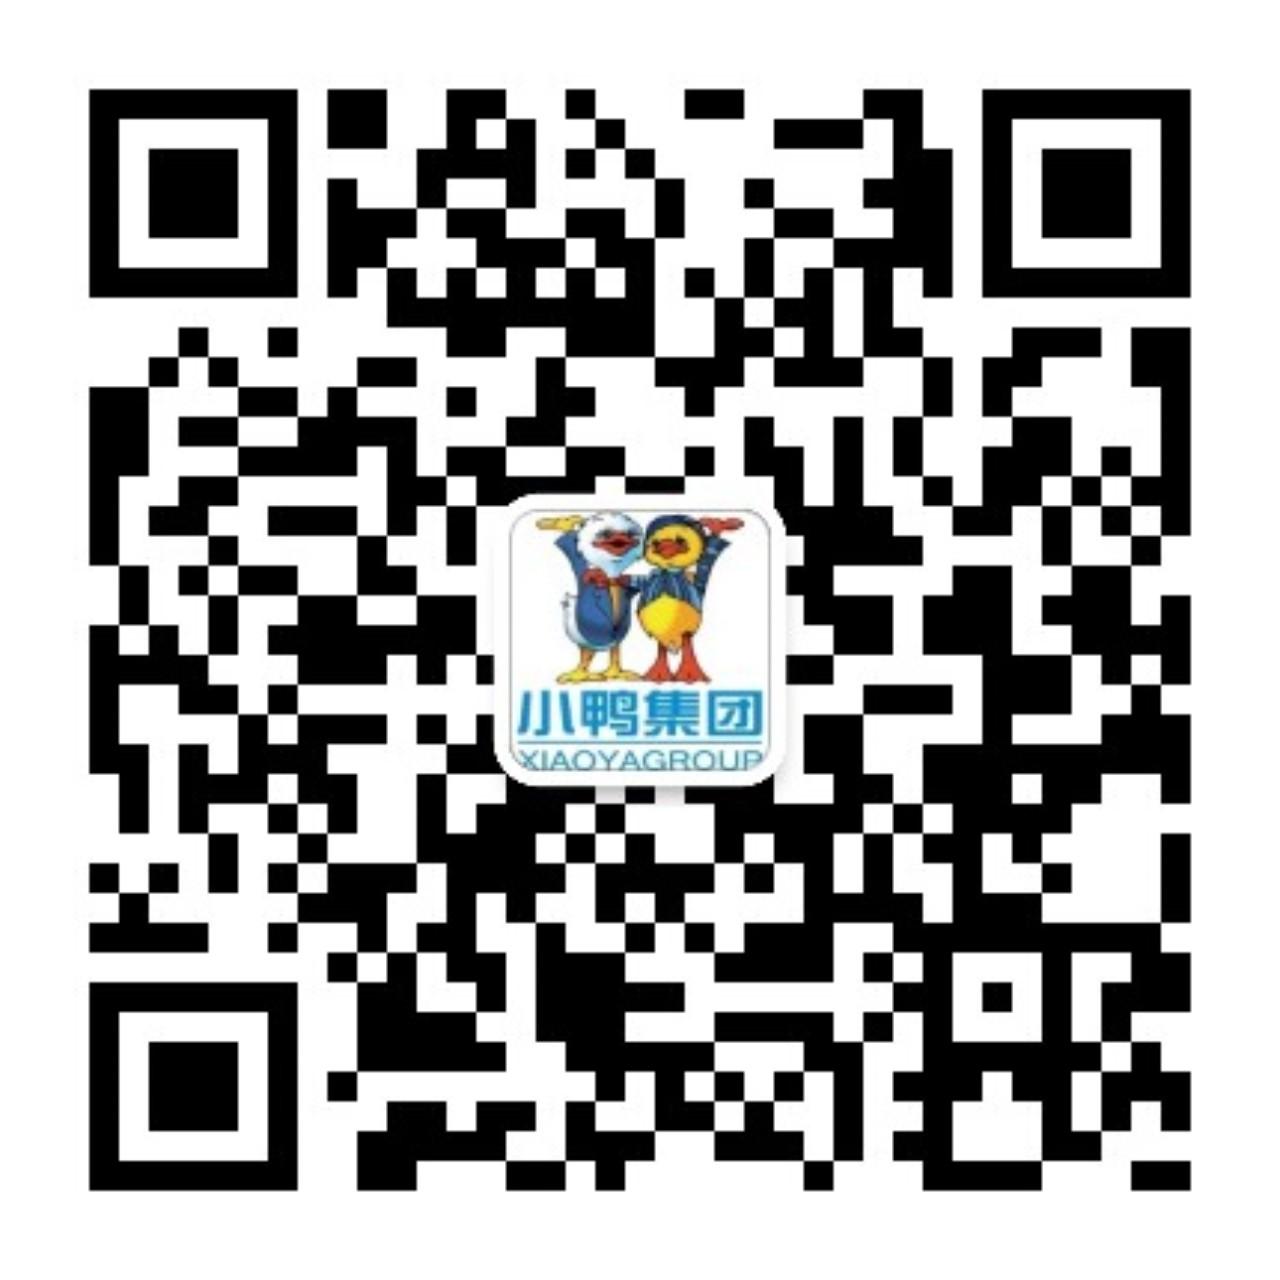 2019vwin德赢ac米兰 app下载二维码1.jpg